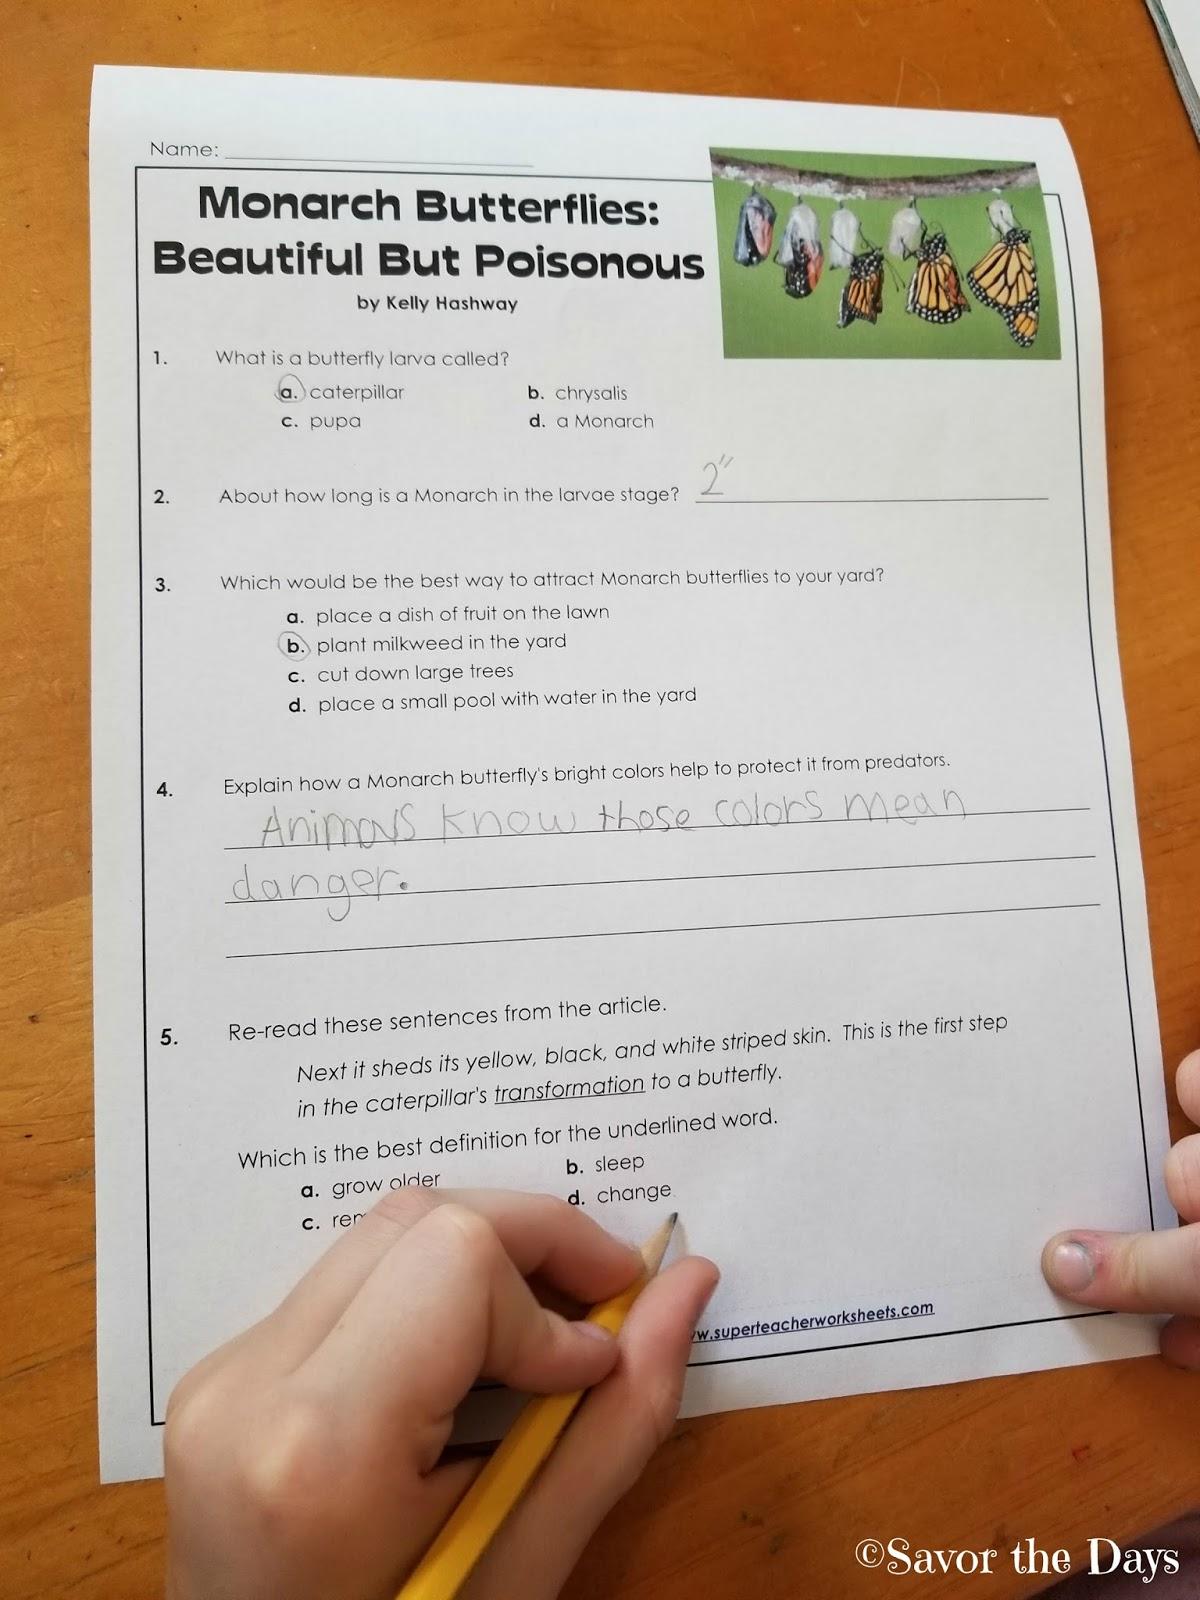 Savor The Days: Printables for Your Homeschool - Super Teacher ...